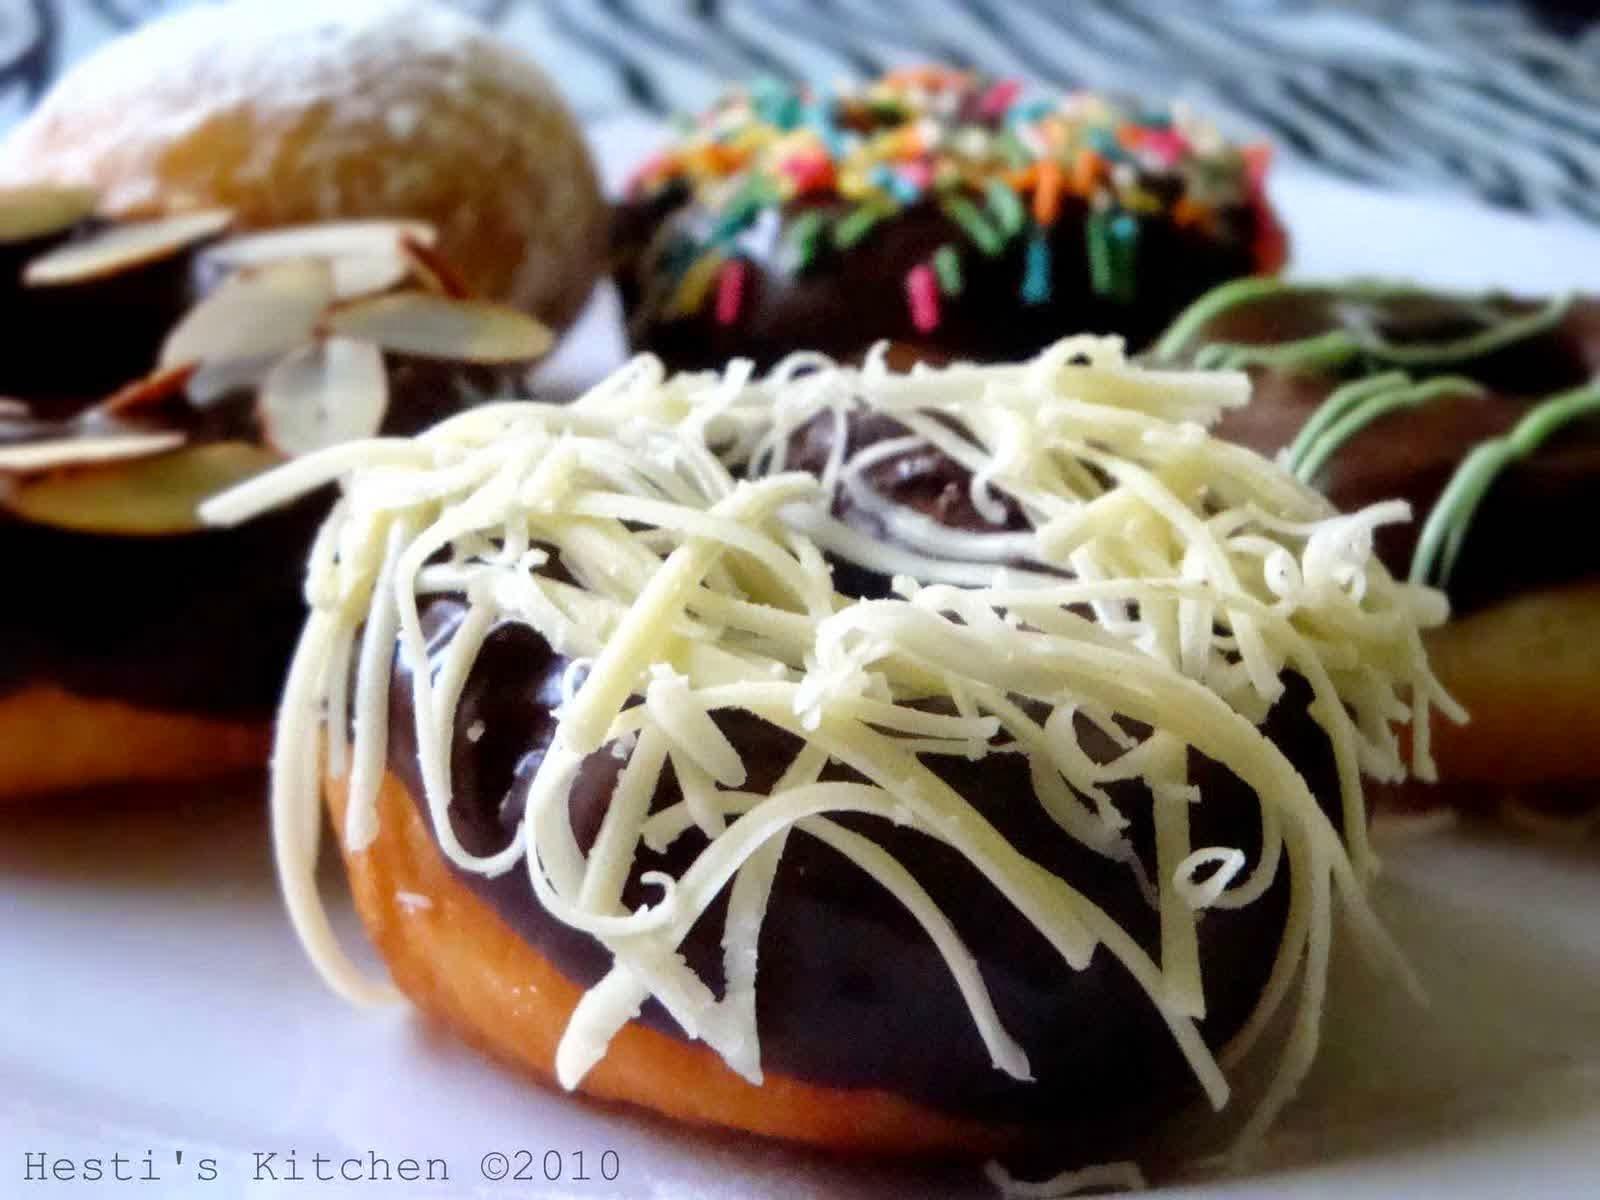 donuts, choco donuts, dunkin donuts, resep donat, donat, donat coklat, donat keju, donat aneka rasa